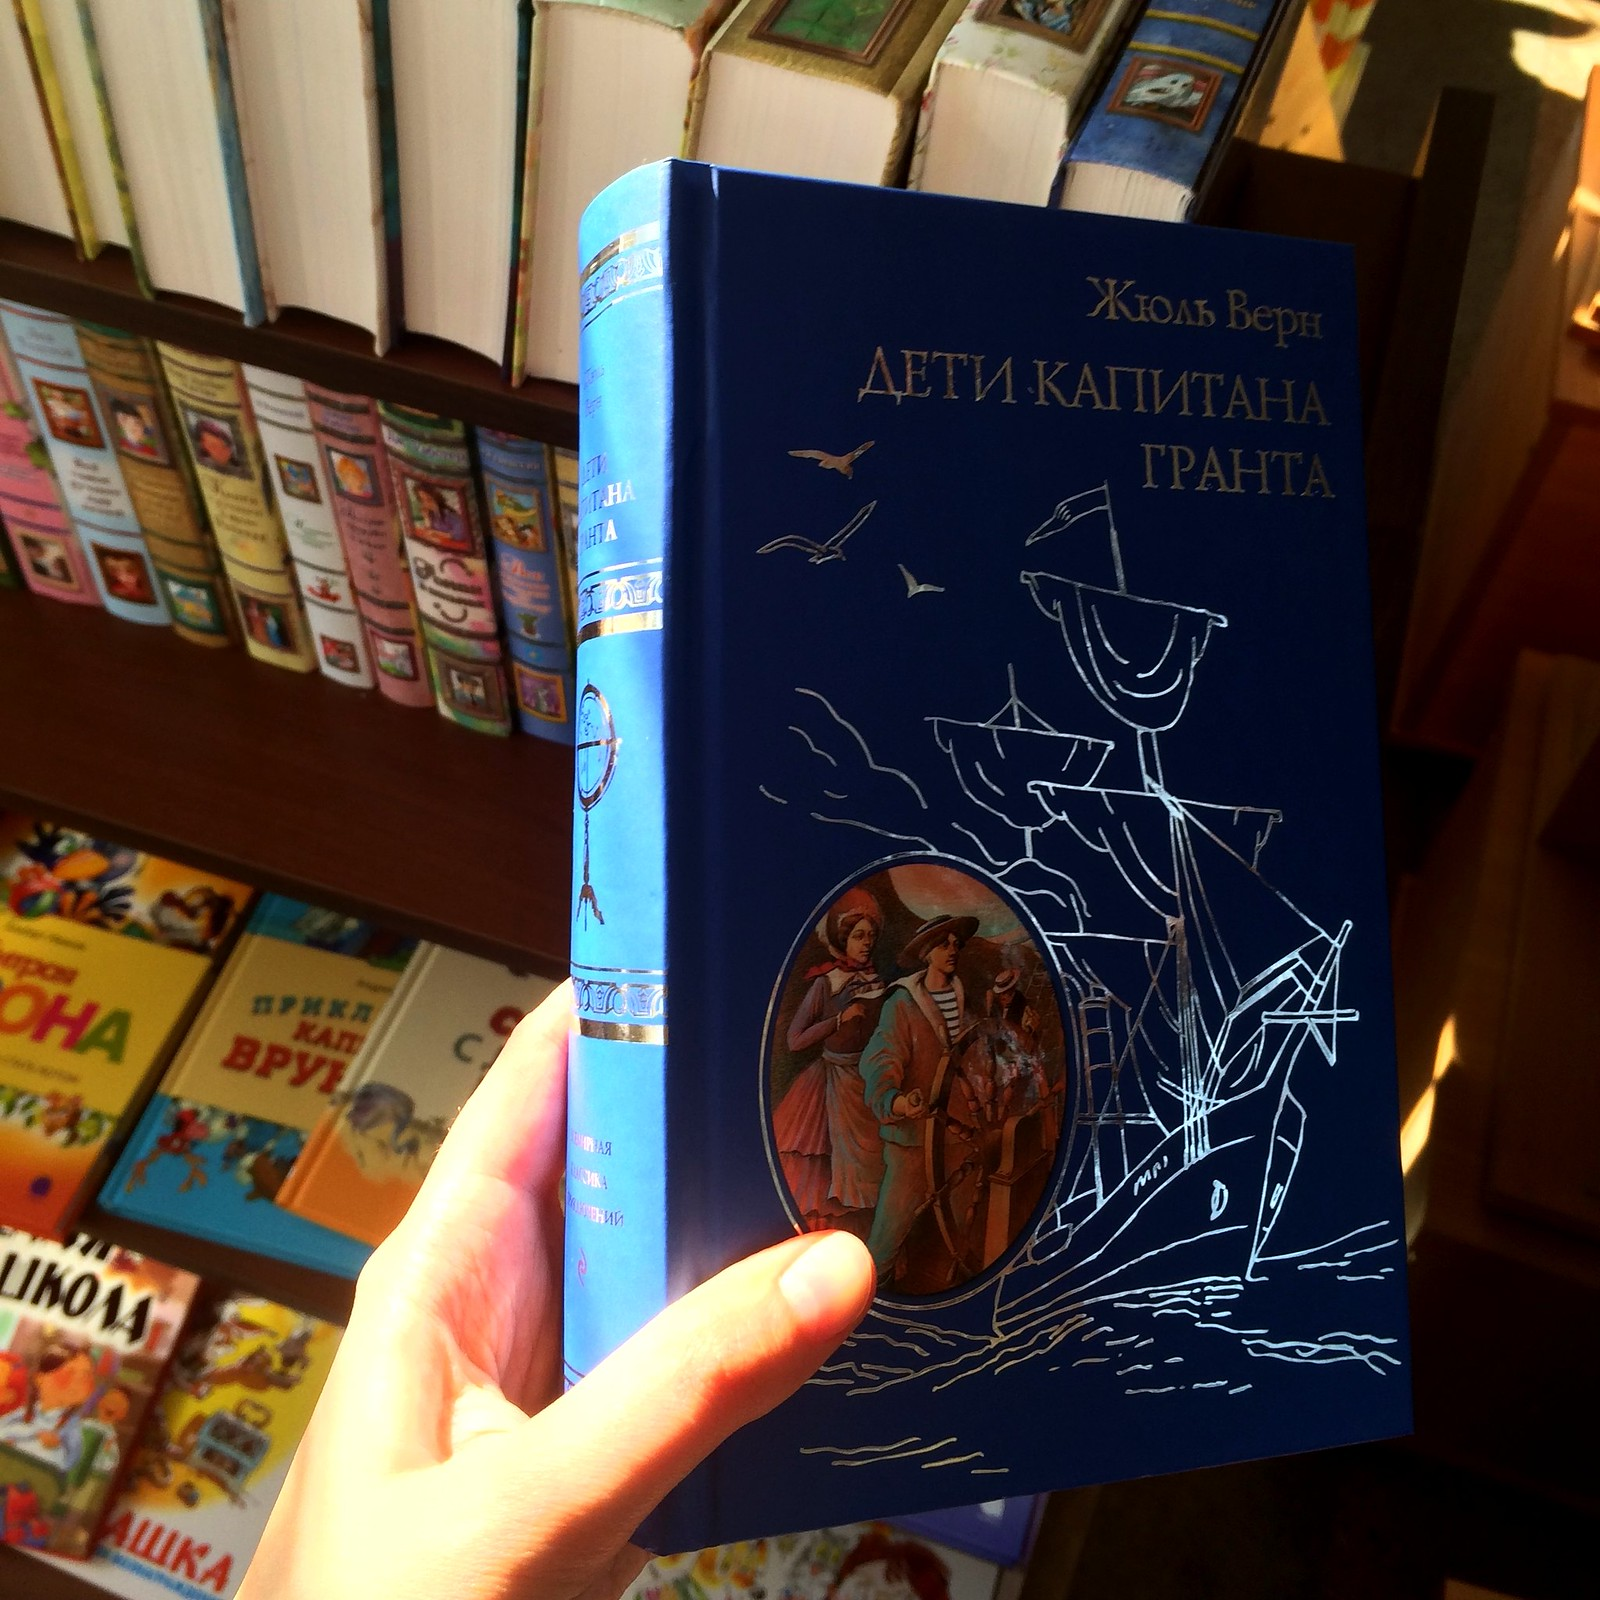 Grodno, Bookstore, Vern